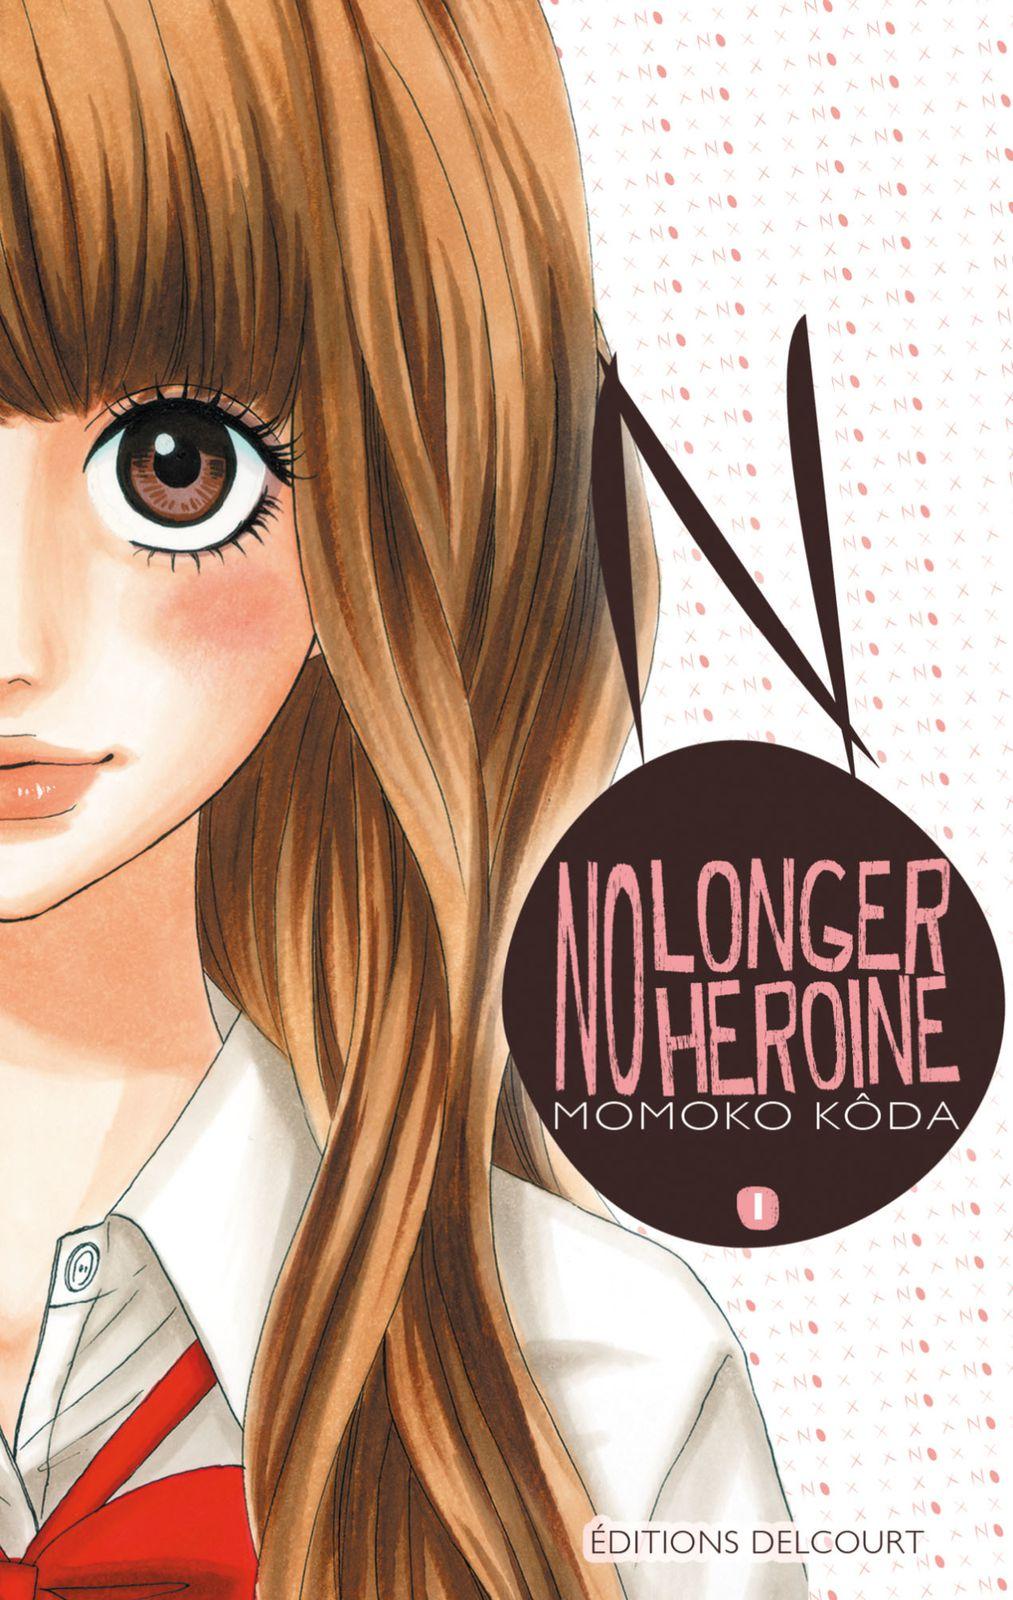 No longer heroine tome 1